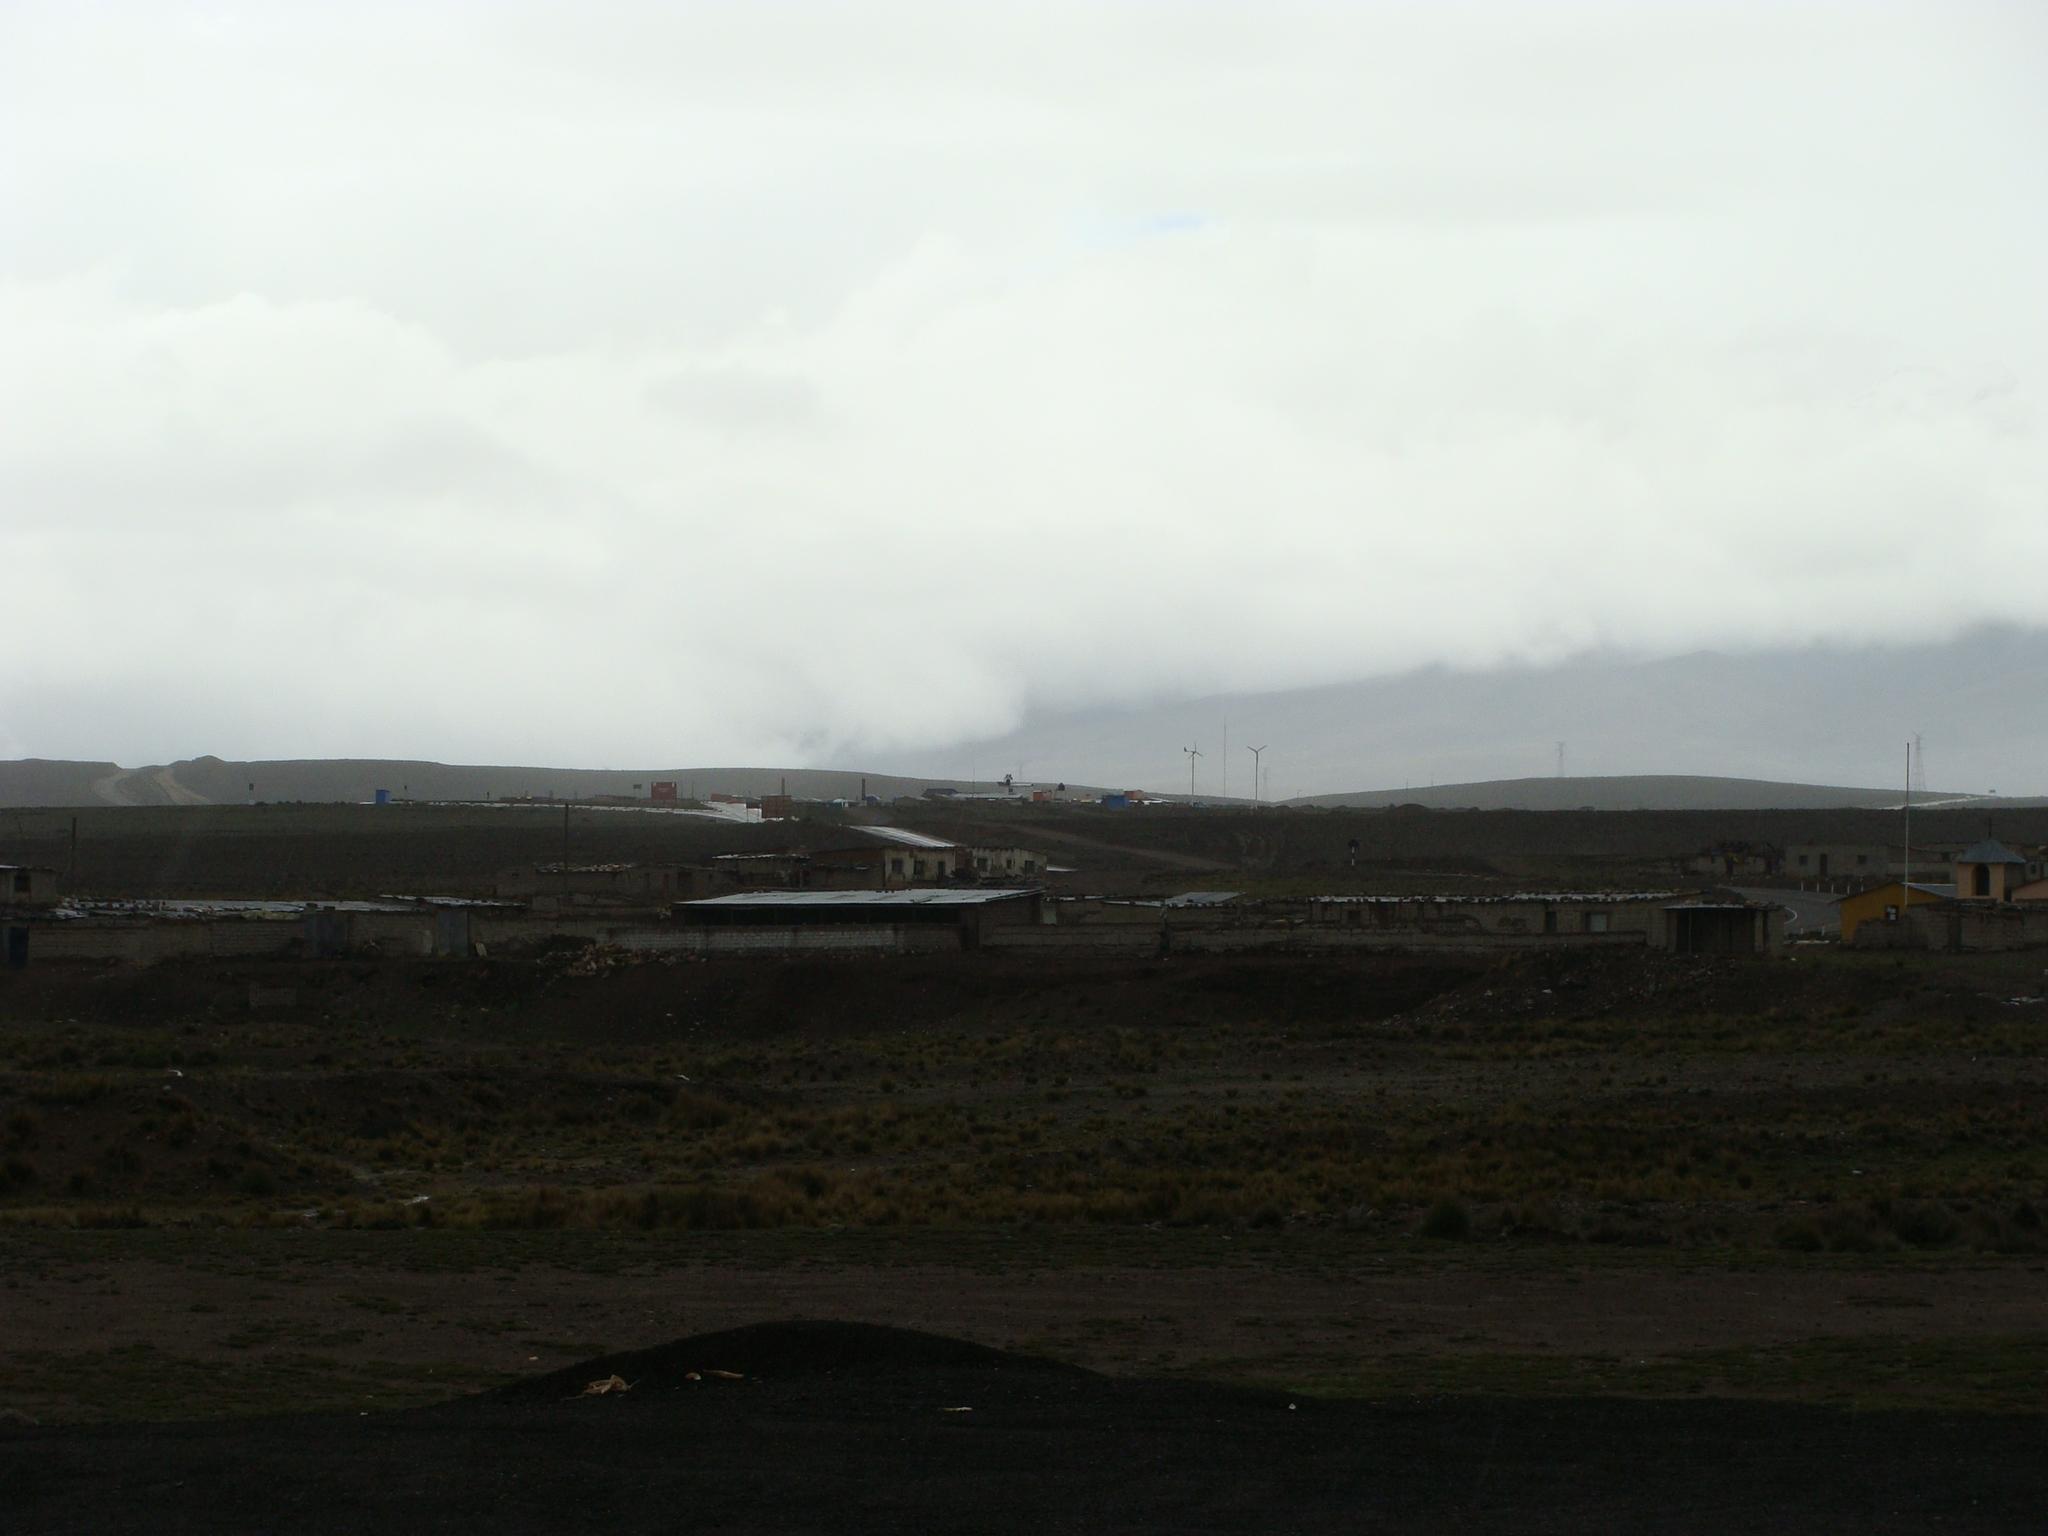 Patahuasi - pohled do kraje za deště dne 19. 2. 2011